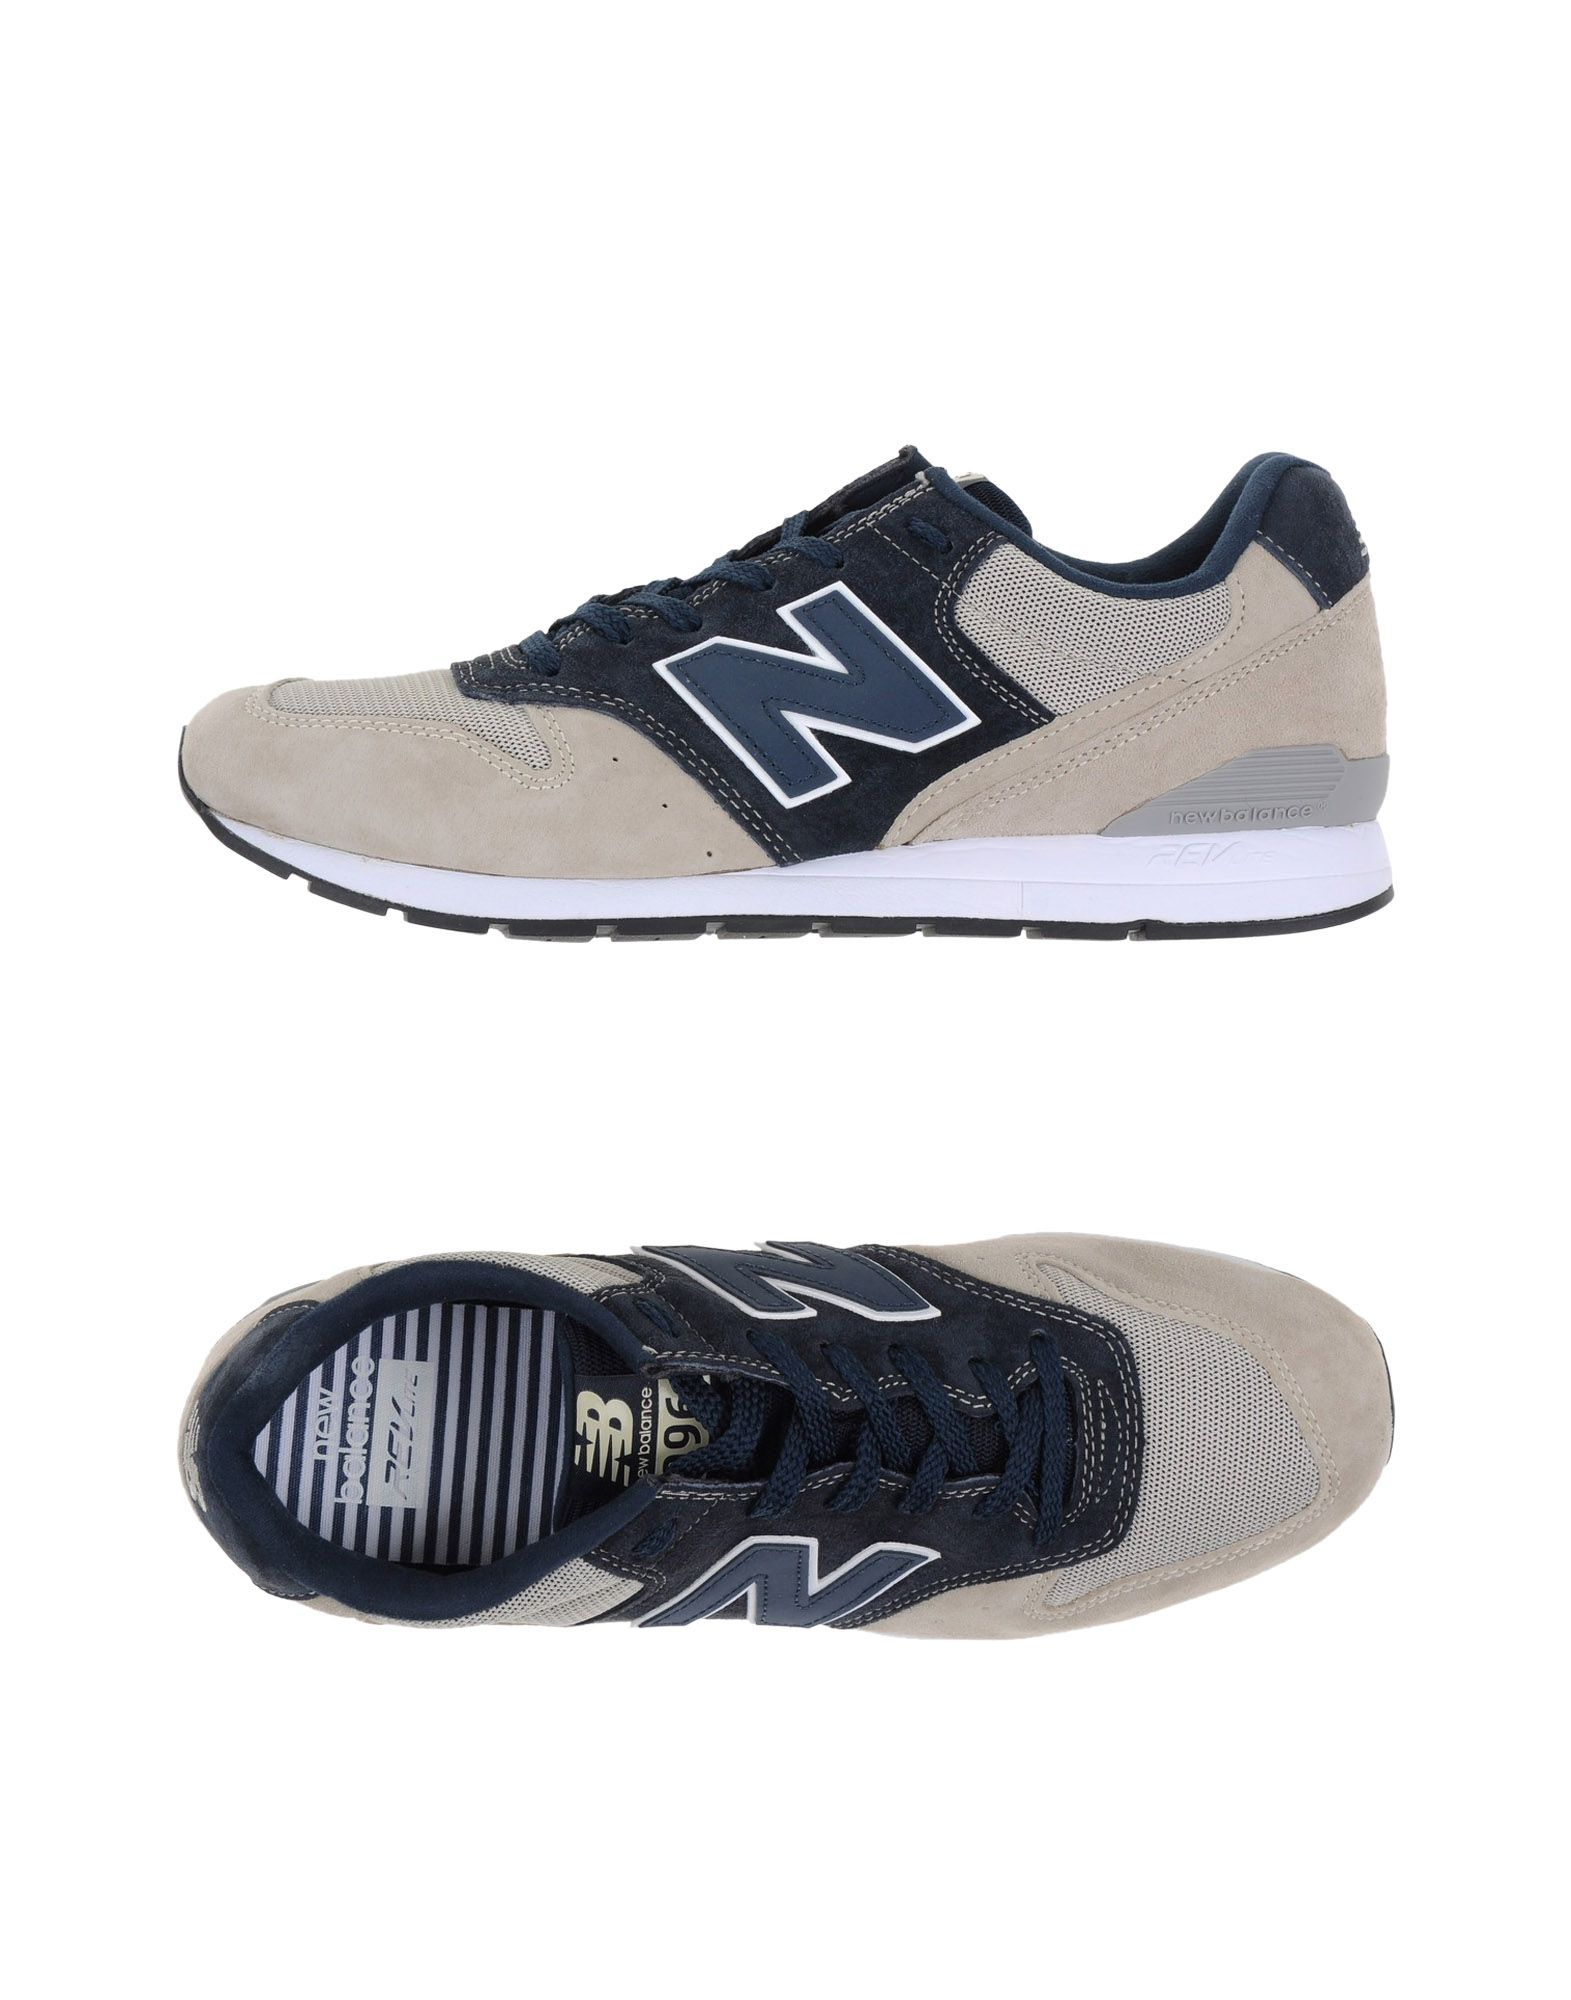 Sneakers New Balance 996 Mesh - Uomo - Acquista online su